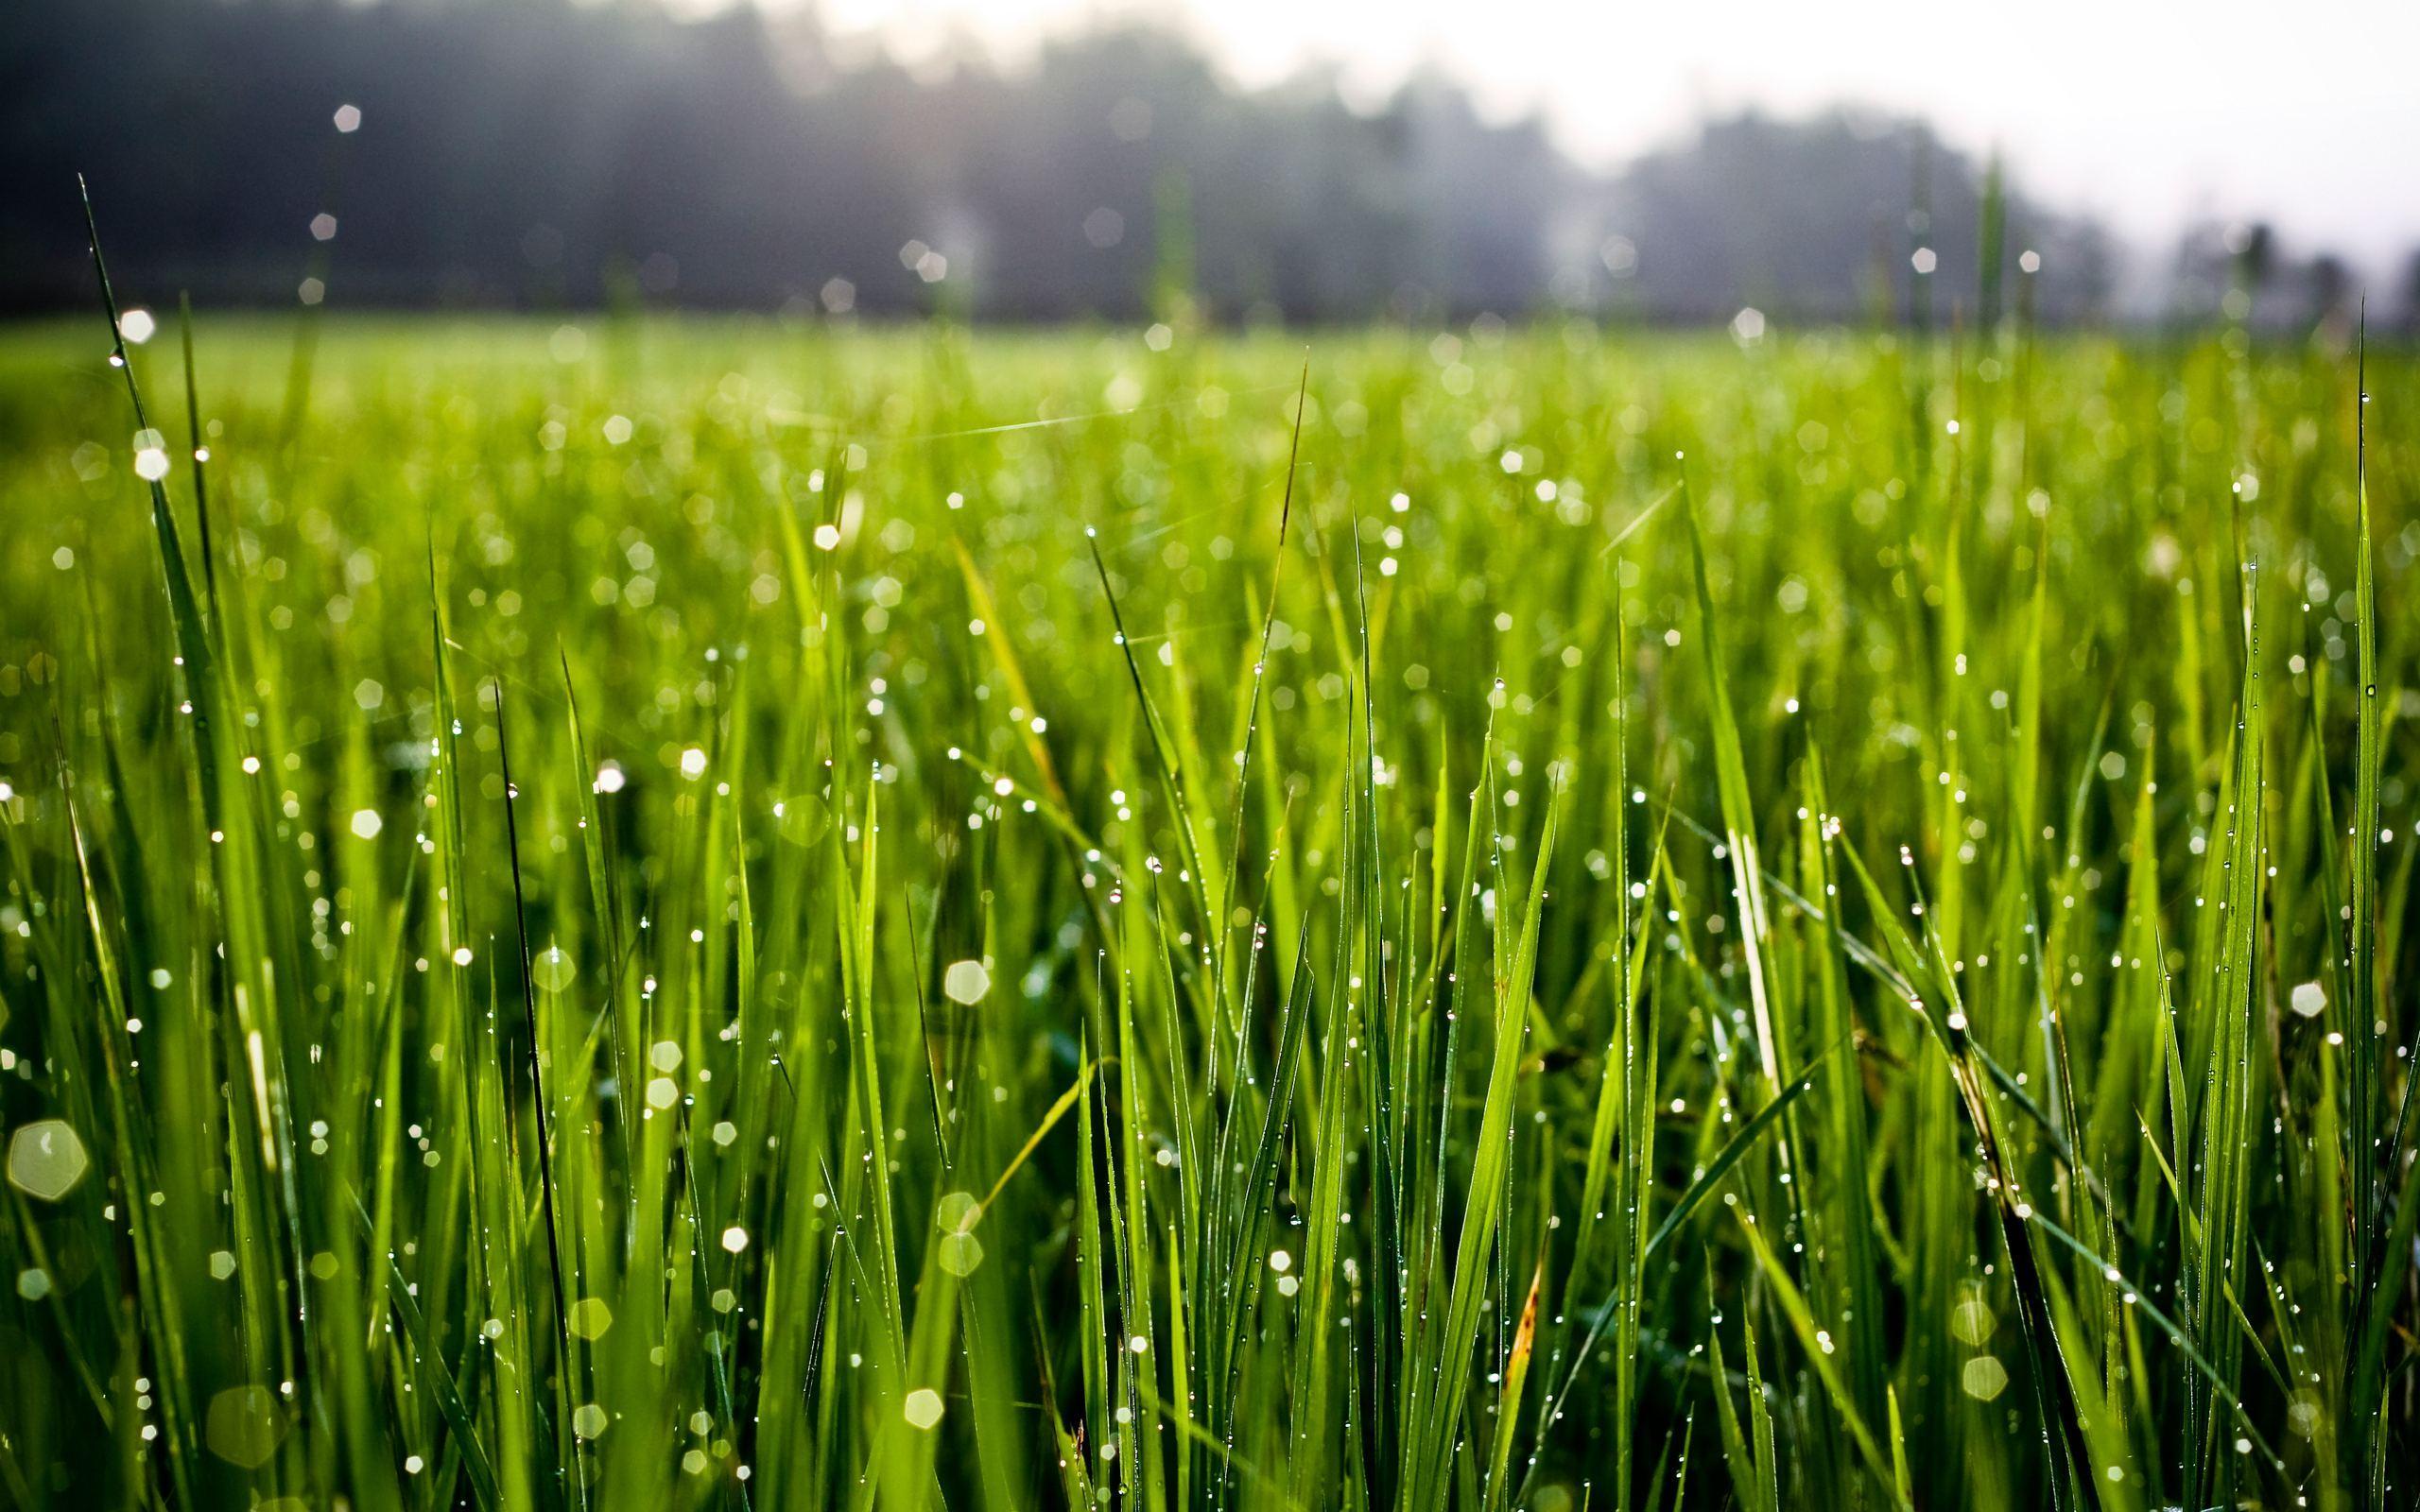 Image result for dew on grass image